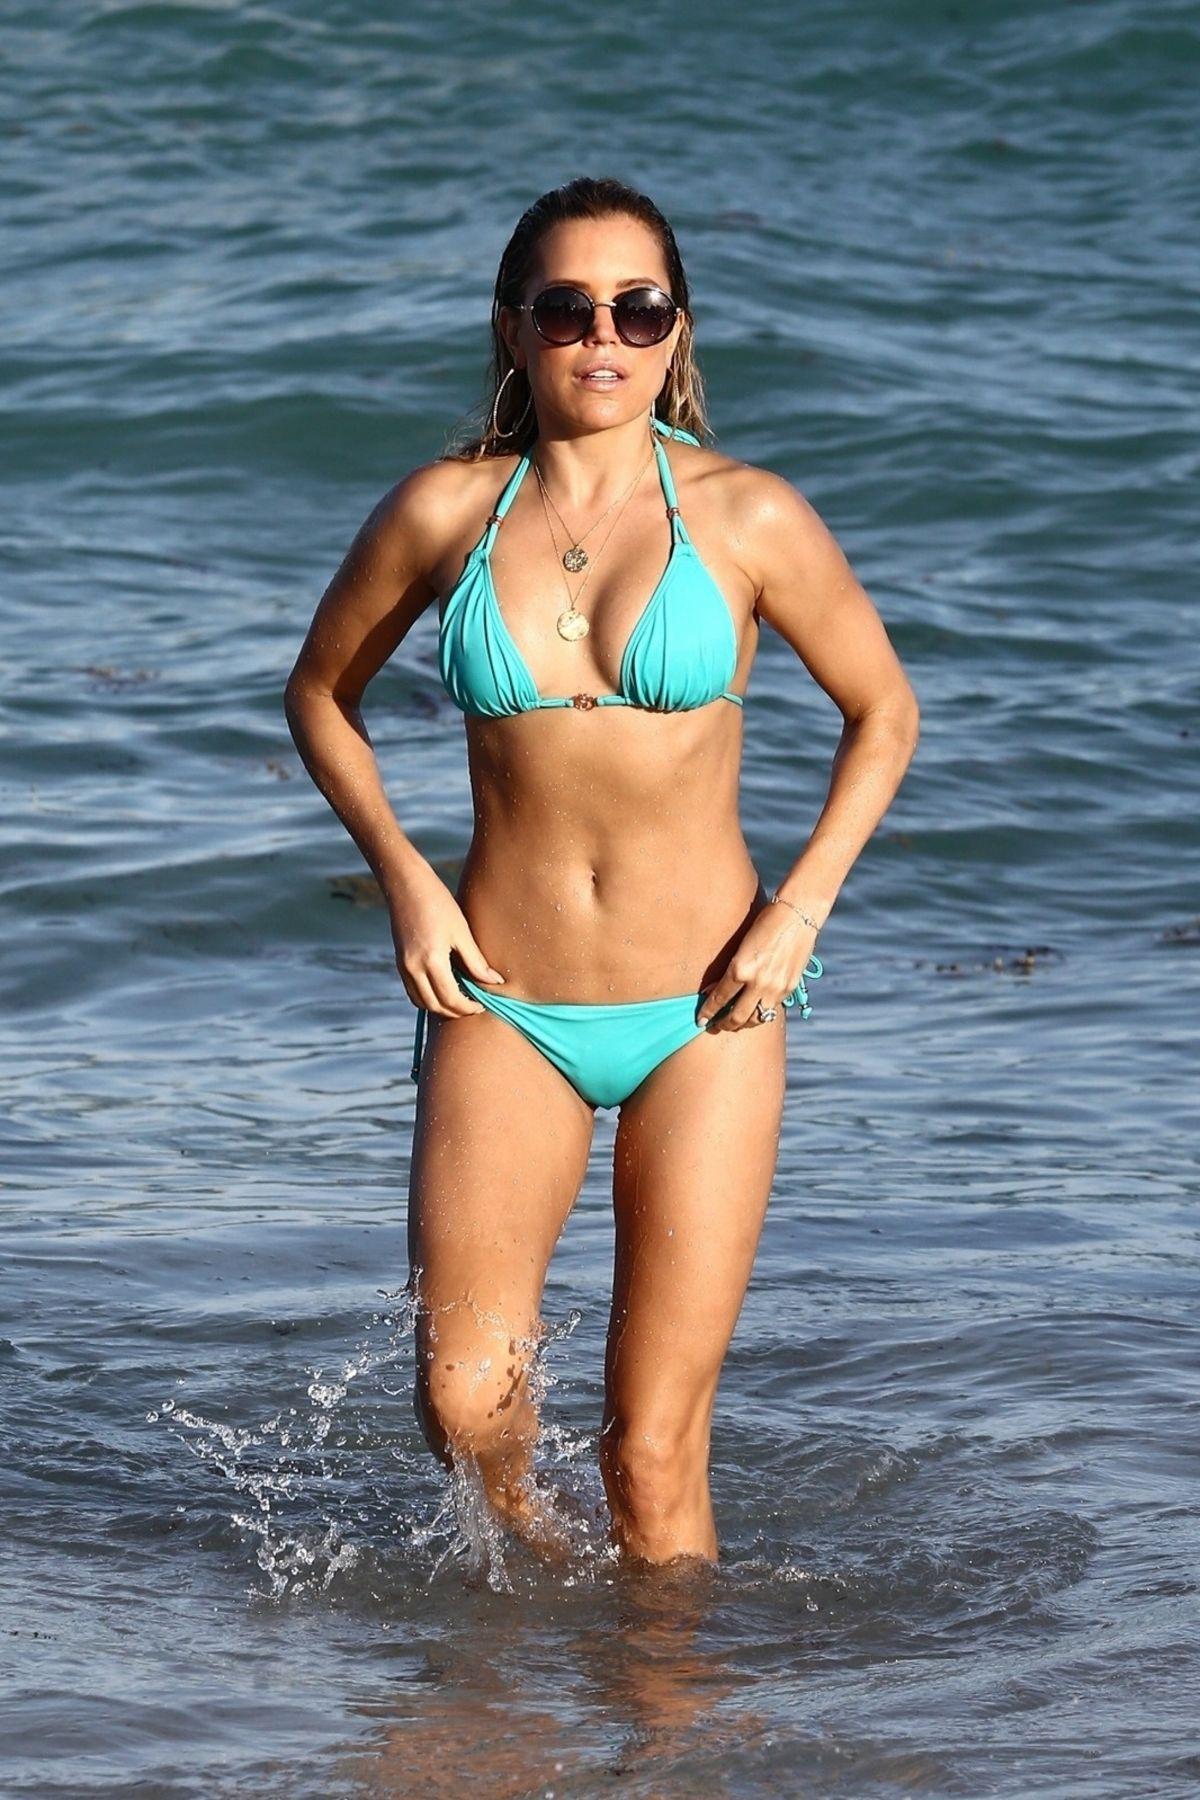 Beste SYLVIE MEIS in Bikini on the Beach in Miami 12/30/2018 – HawtCelebs YA-78